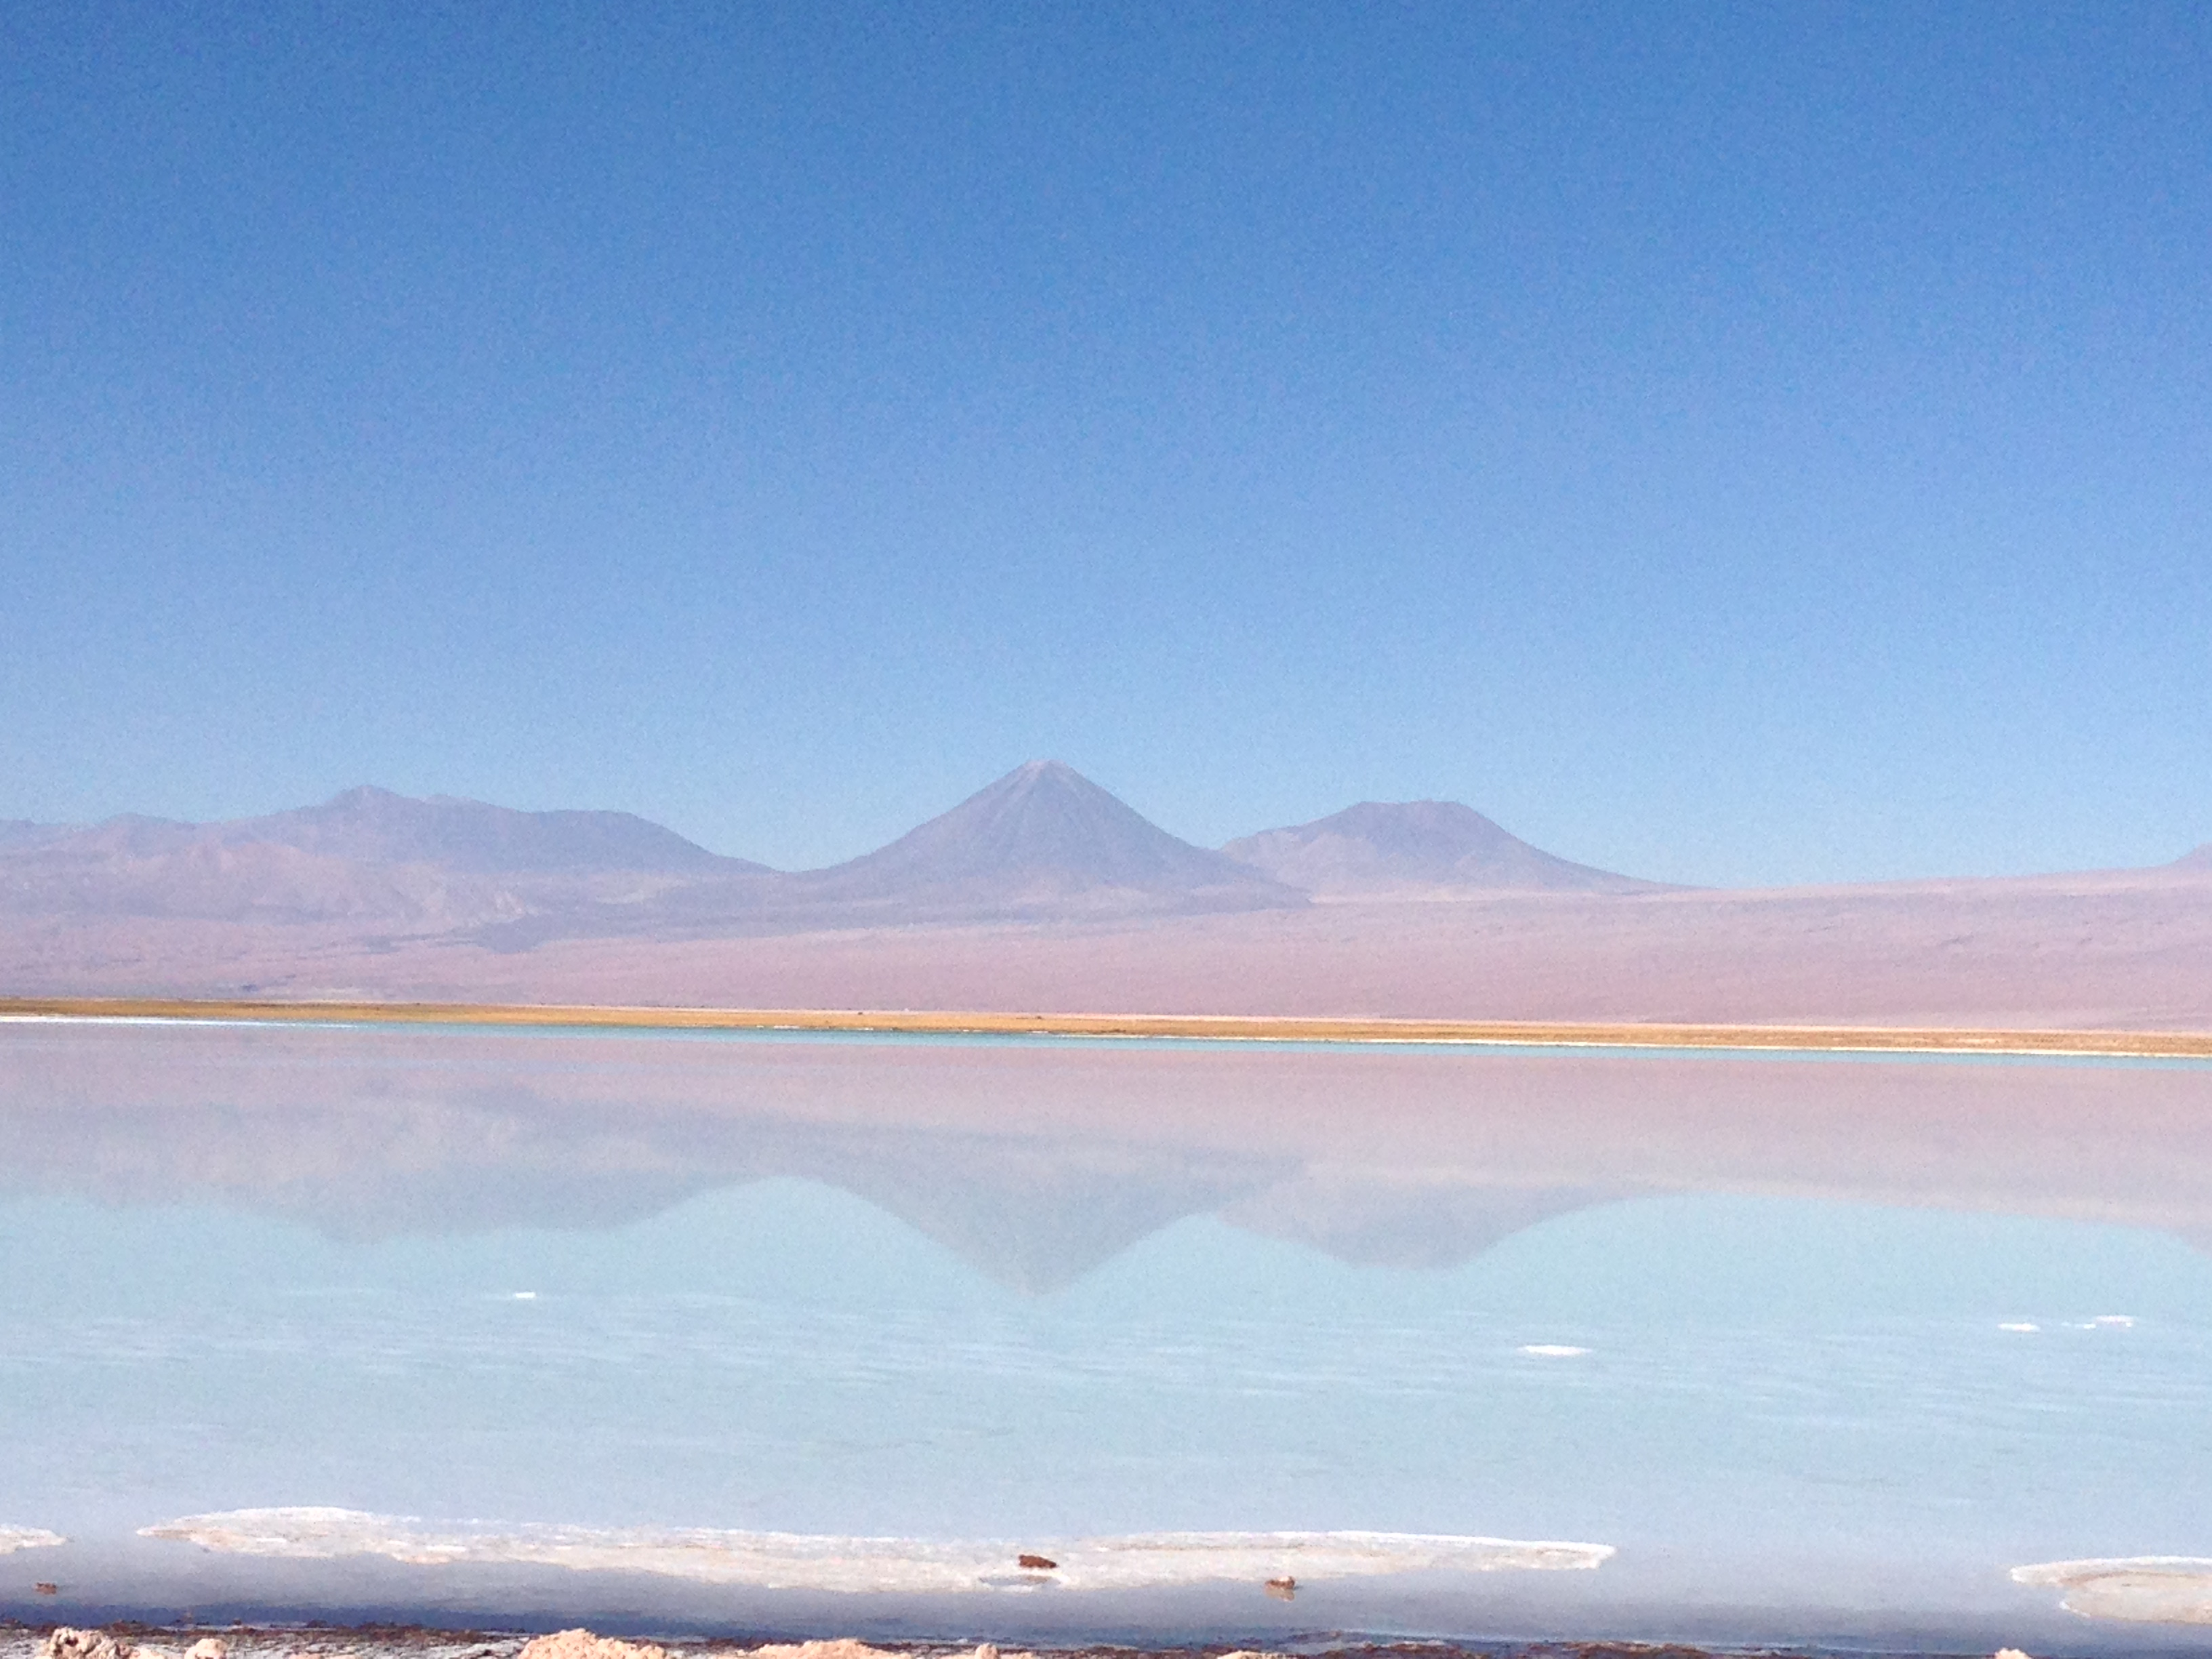 Cile Alida Travel